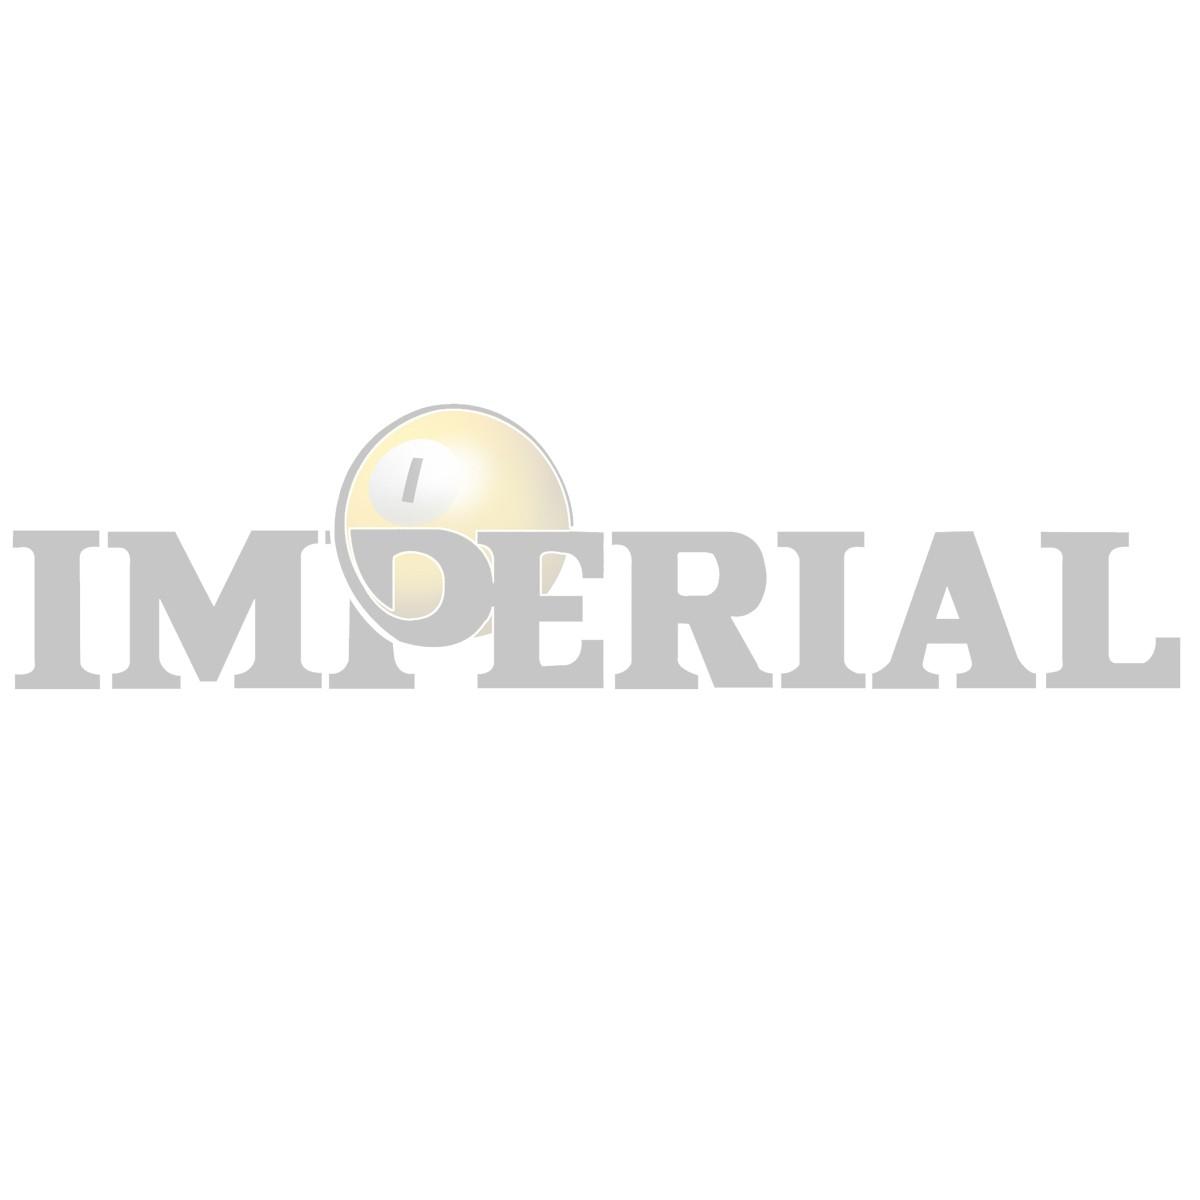 Toronto Blue Jays Home vs. Away Billiard Ball Set